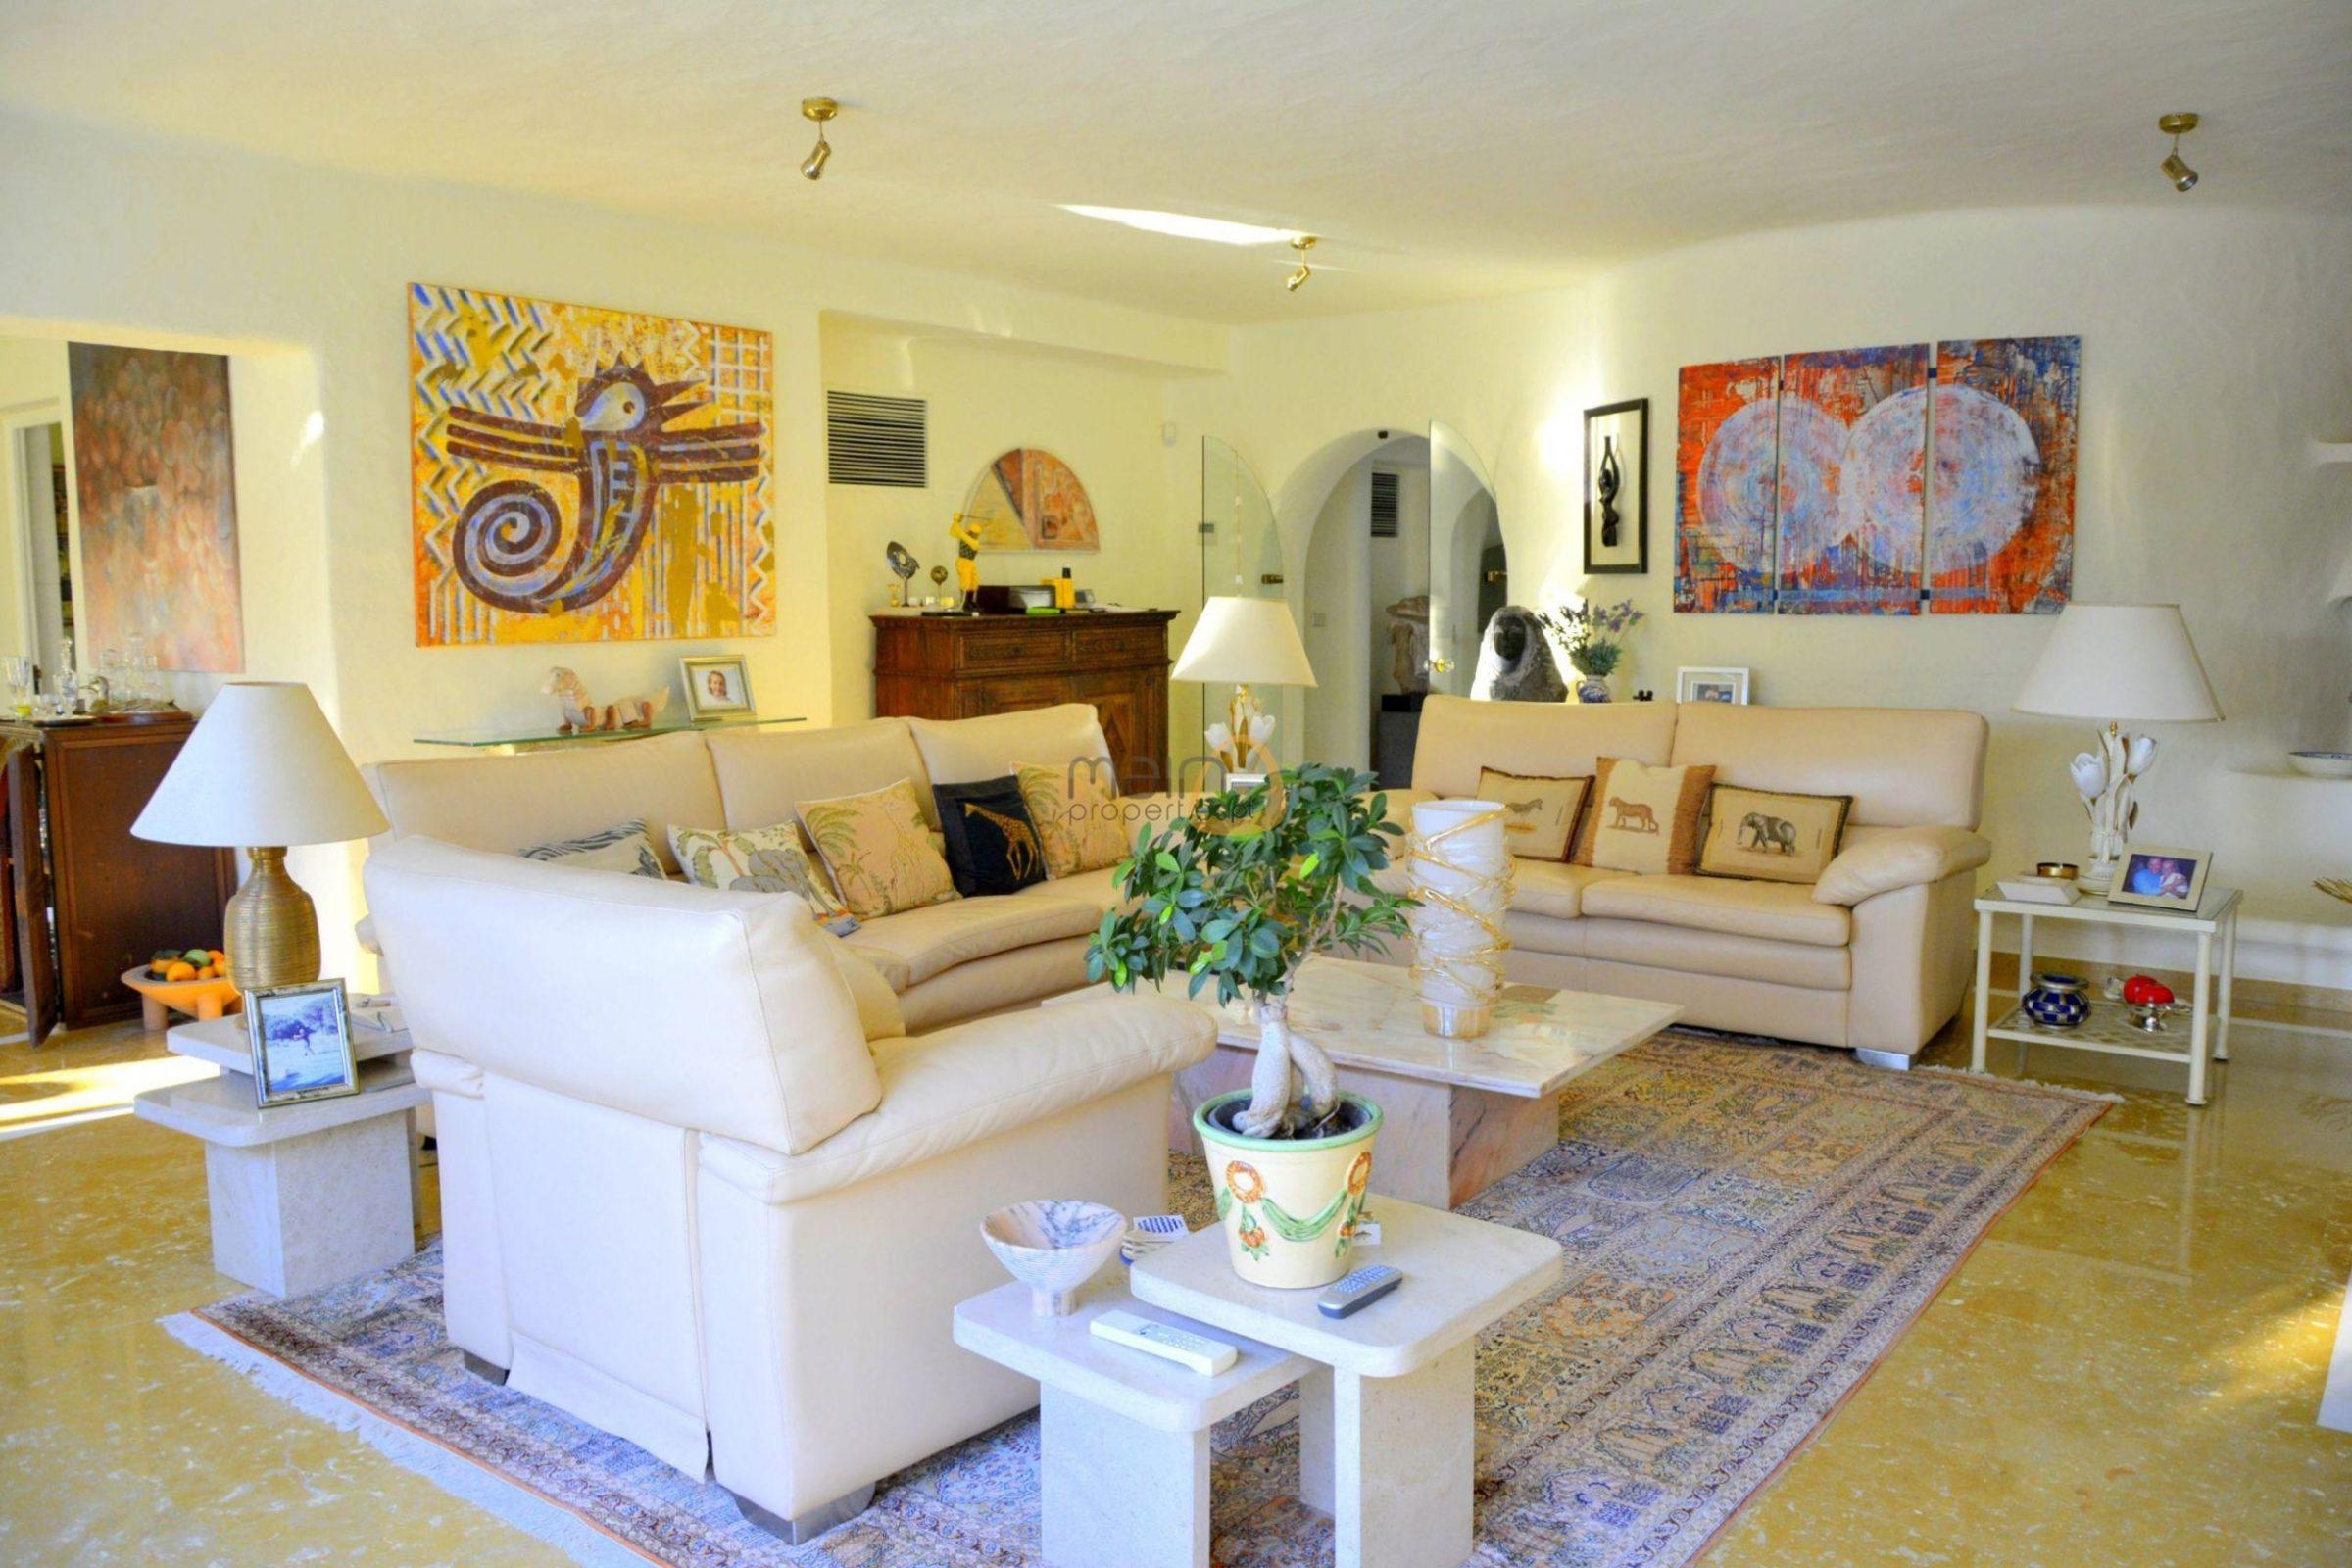 [:pt]Moradia com 5 quartos na Quinta do Lago :: Sala :: MainProperties :: 020061[:en]villa-quinta-do-lago-algarve-portugal-020061-14[:]